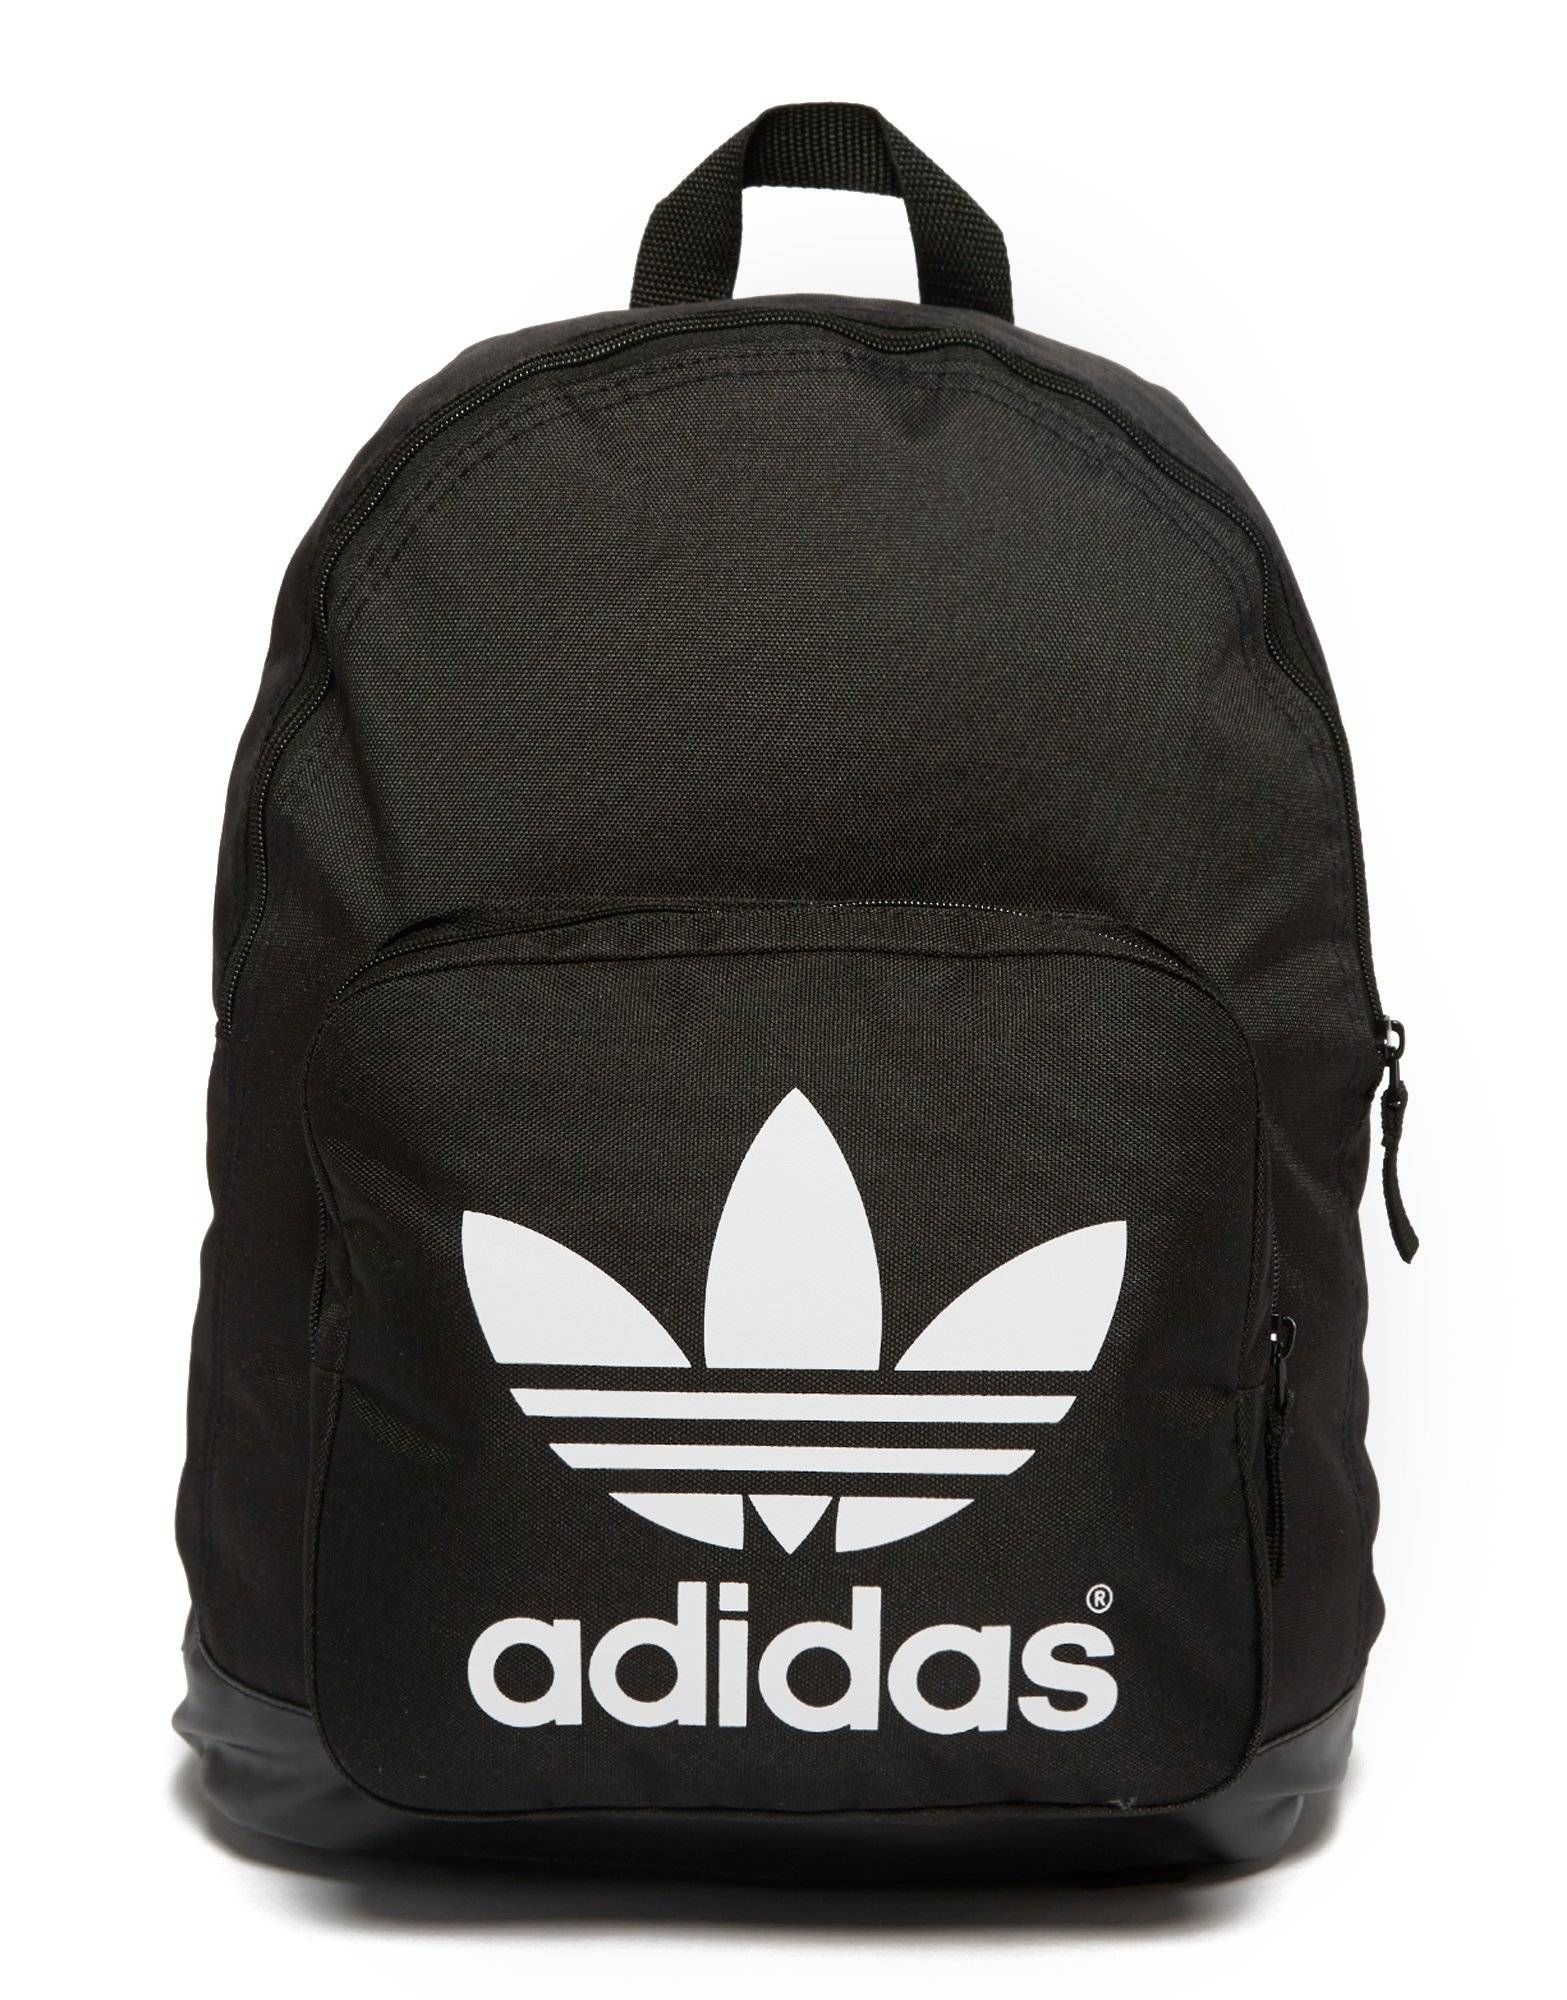 adidas Originals Backpack XS | Svart | Väskor | DV0212